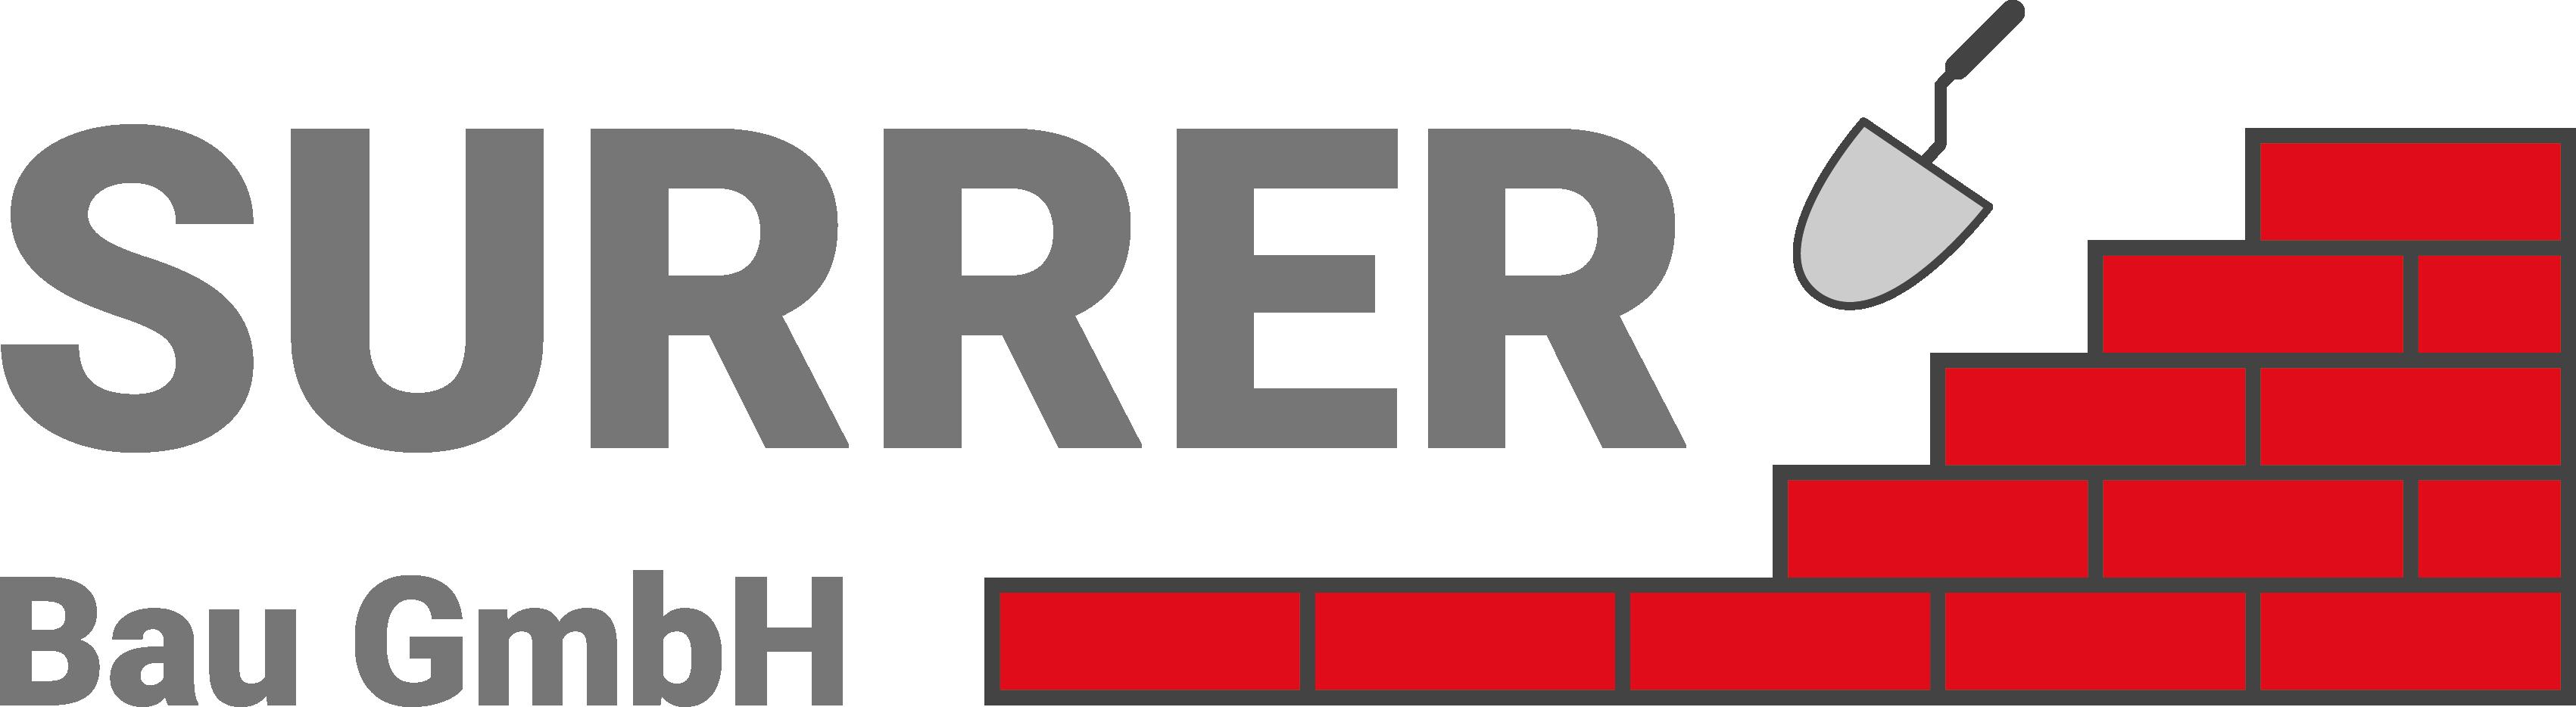 Surrer Bau GmbH